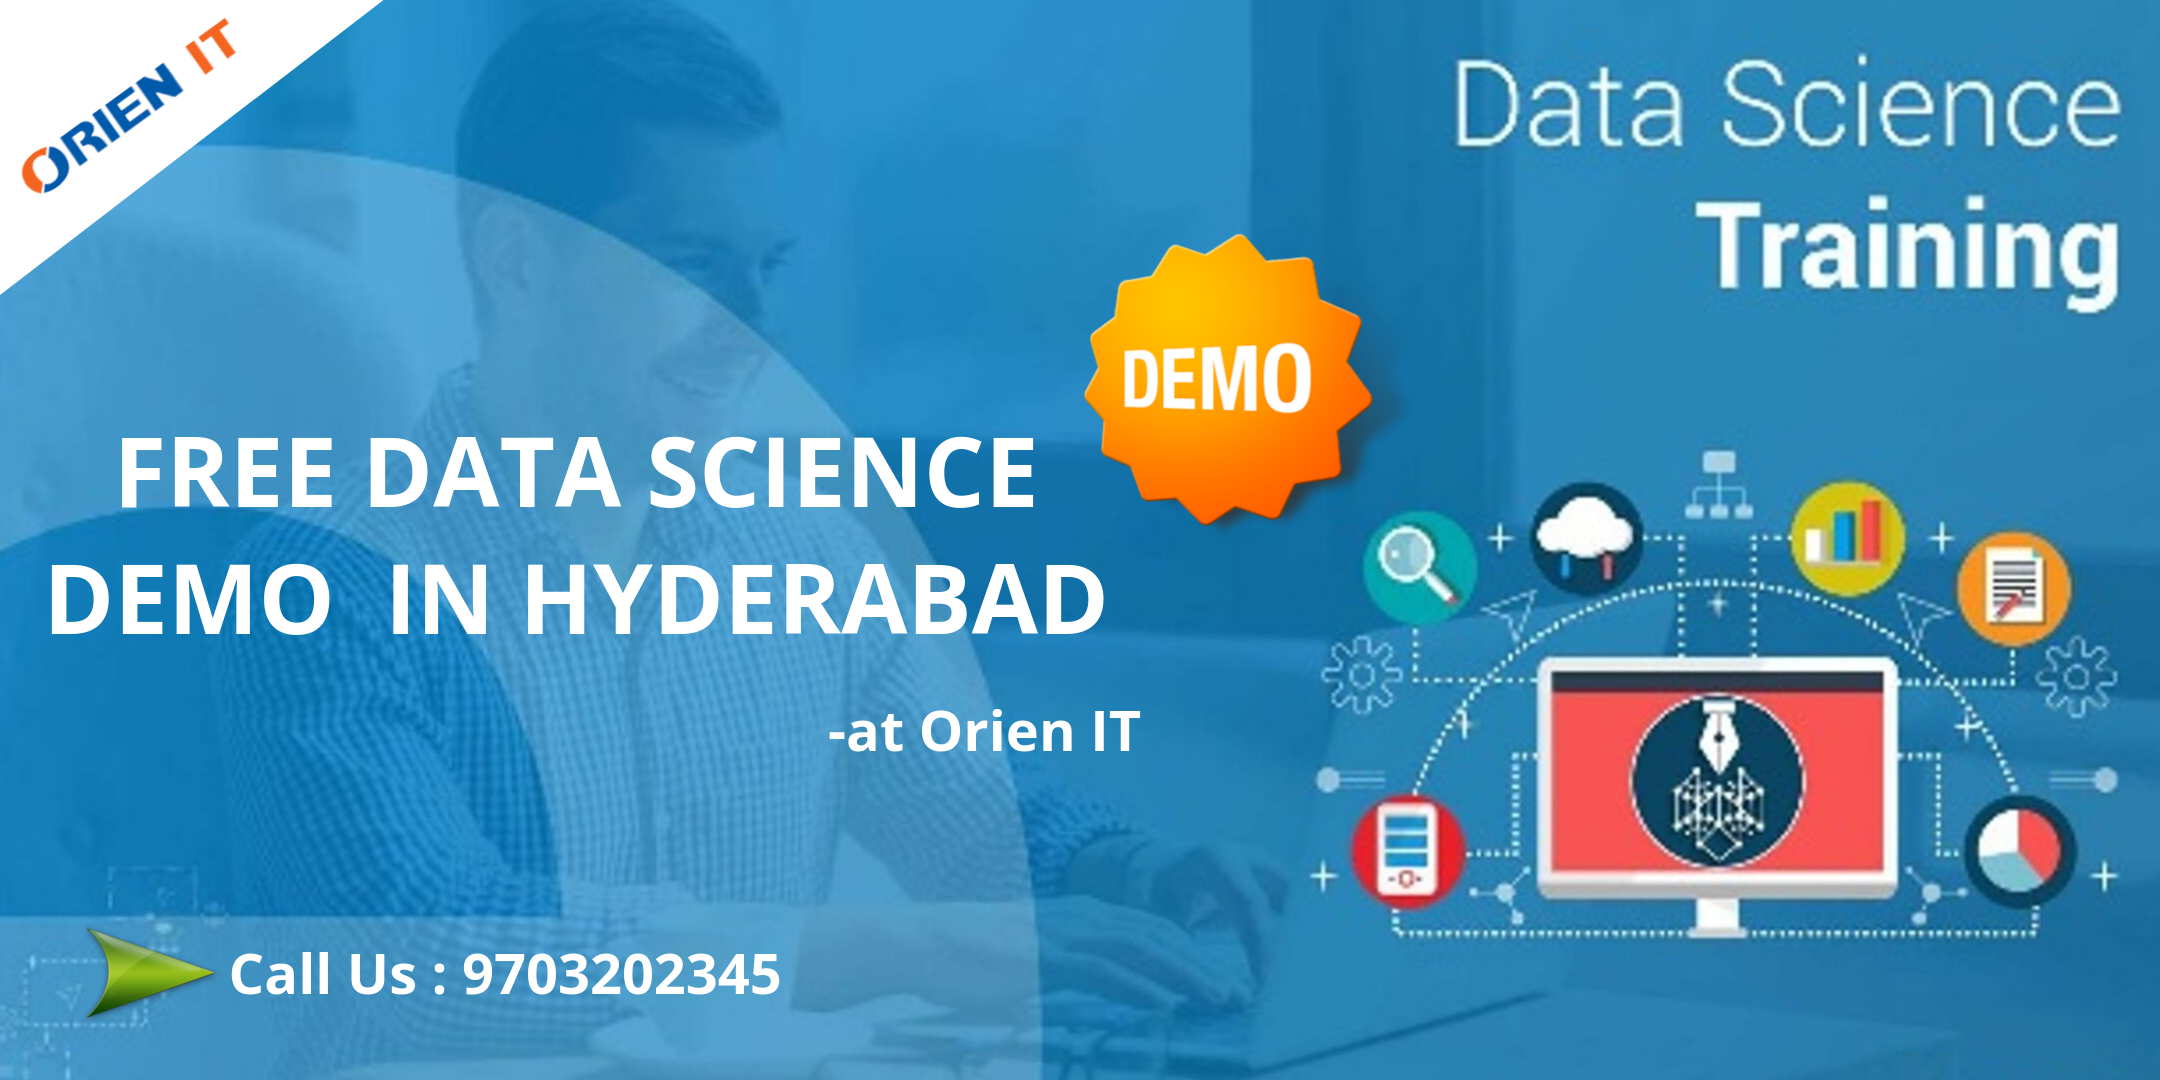 Data Science Demo